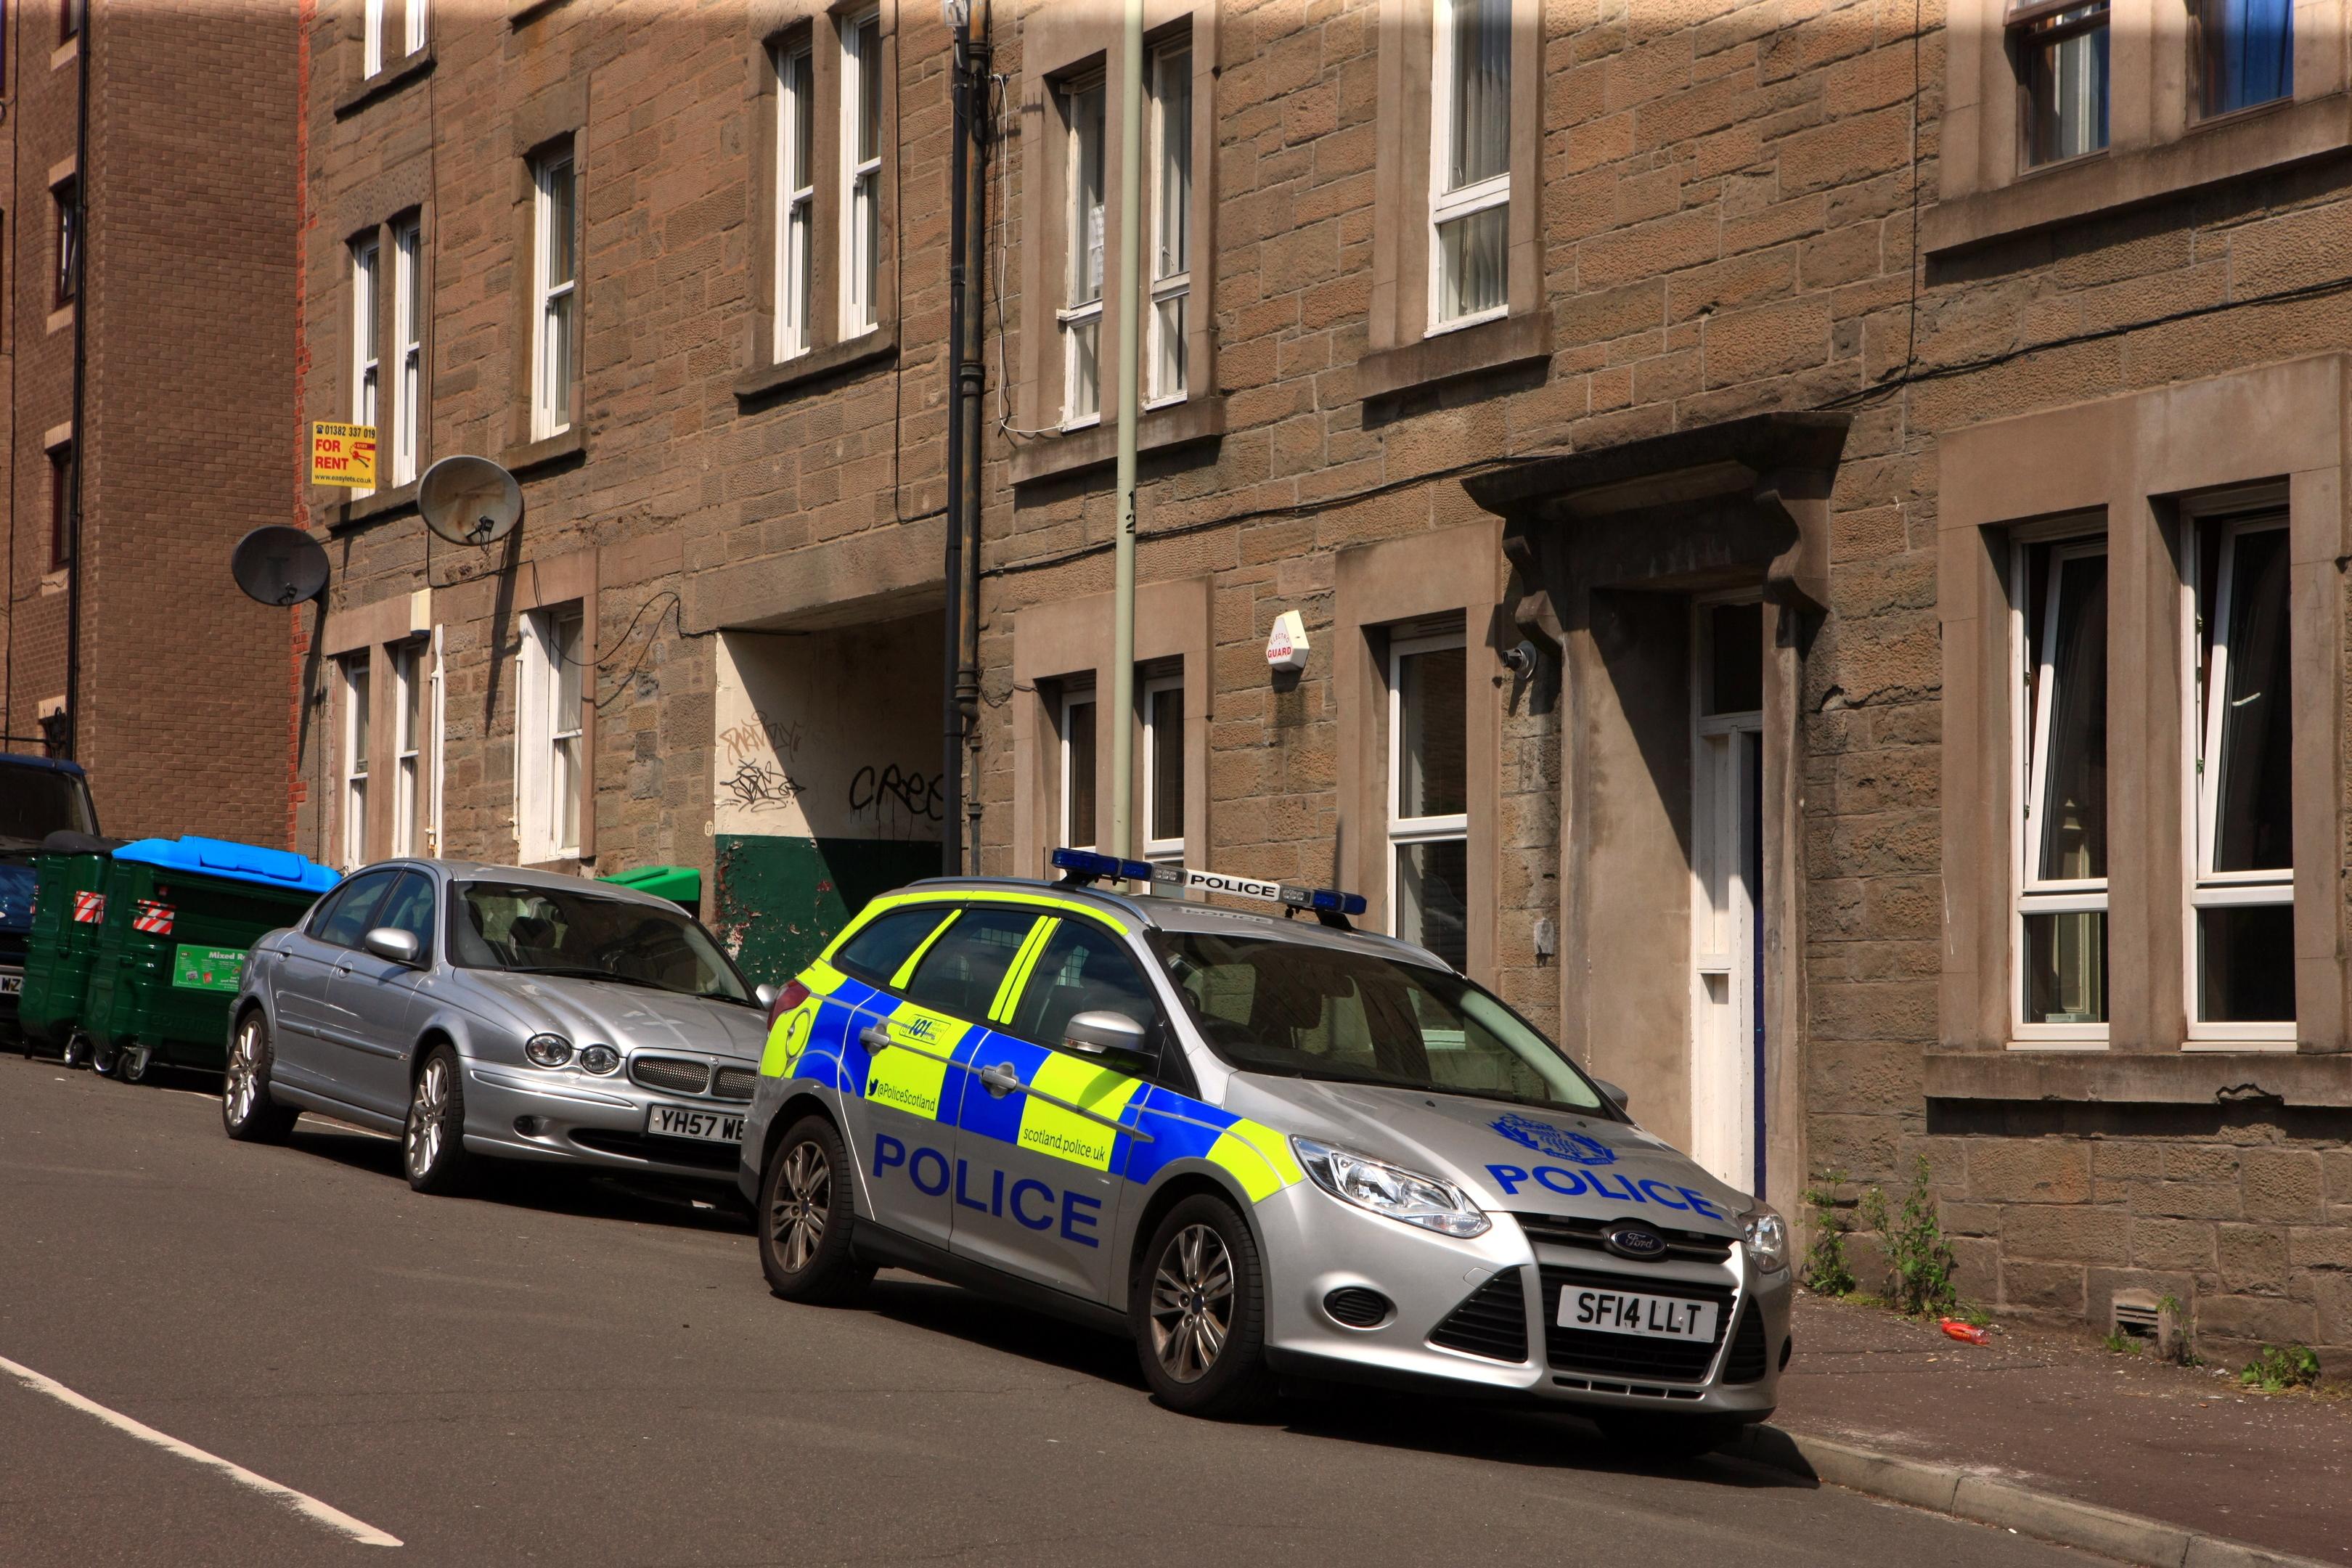 A police vehicle on Cleghorn Street.